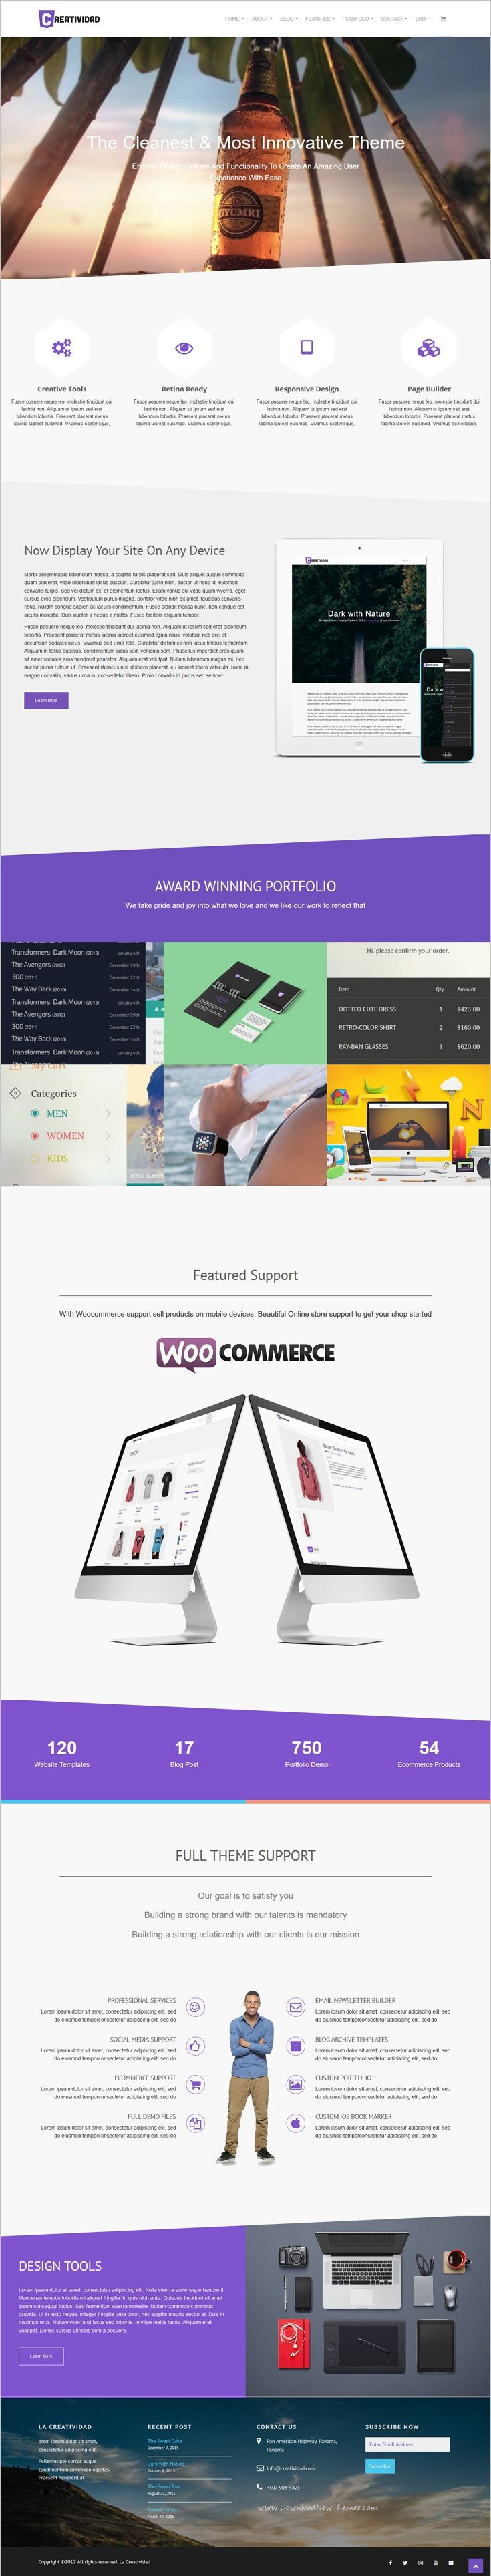 Creatividad is a wonderful responsive #WordPress theme for stunning #agencies websites with 7+ multipurpose homepage layouts download now➩ https://themeforest.net/item/creatividad/14366355?ref=Datasata